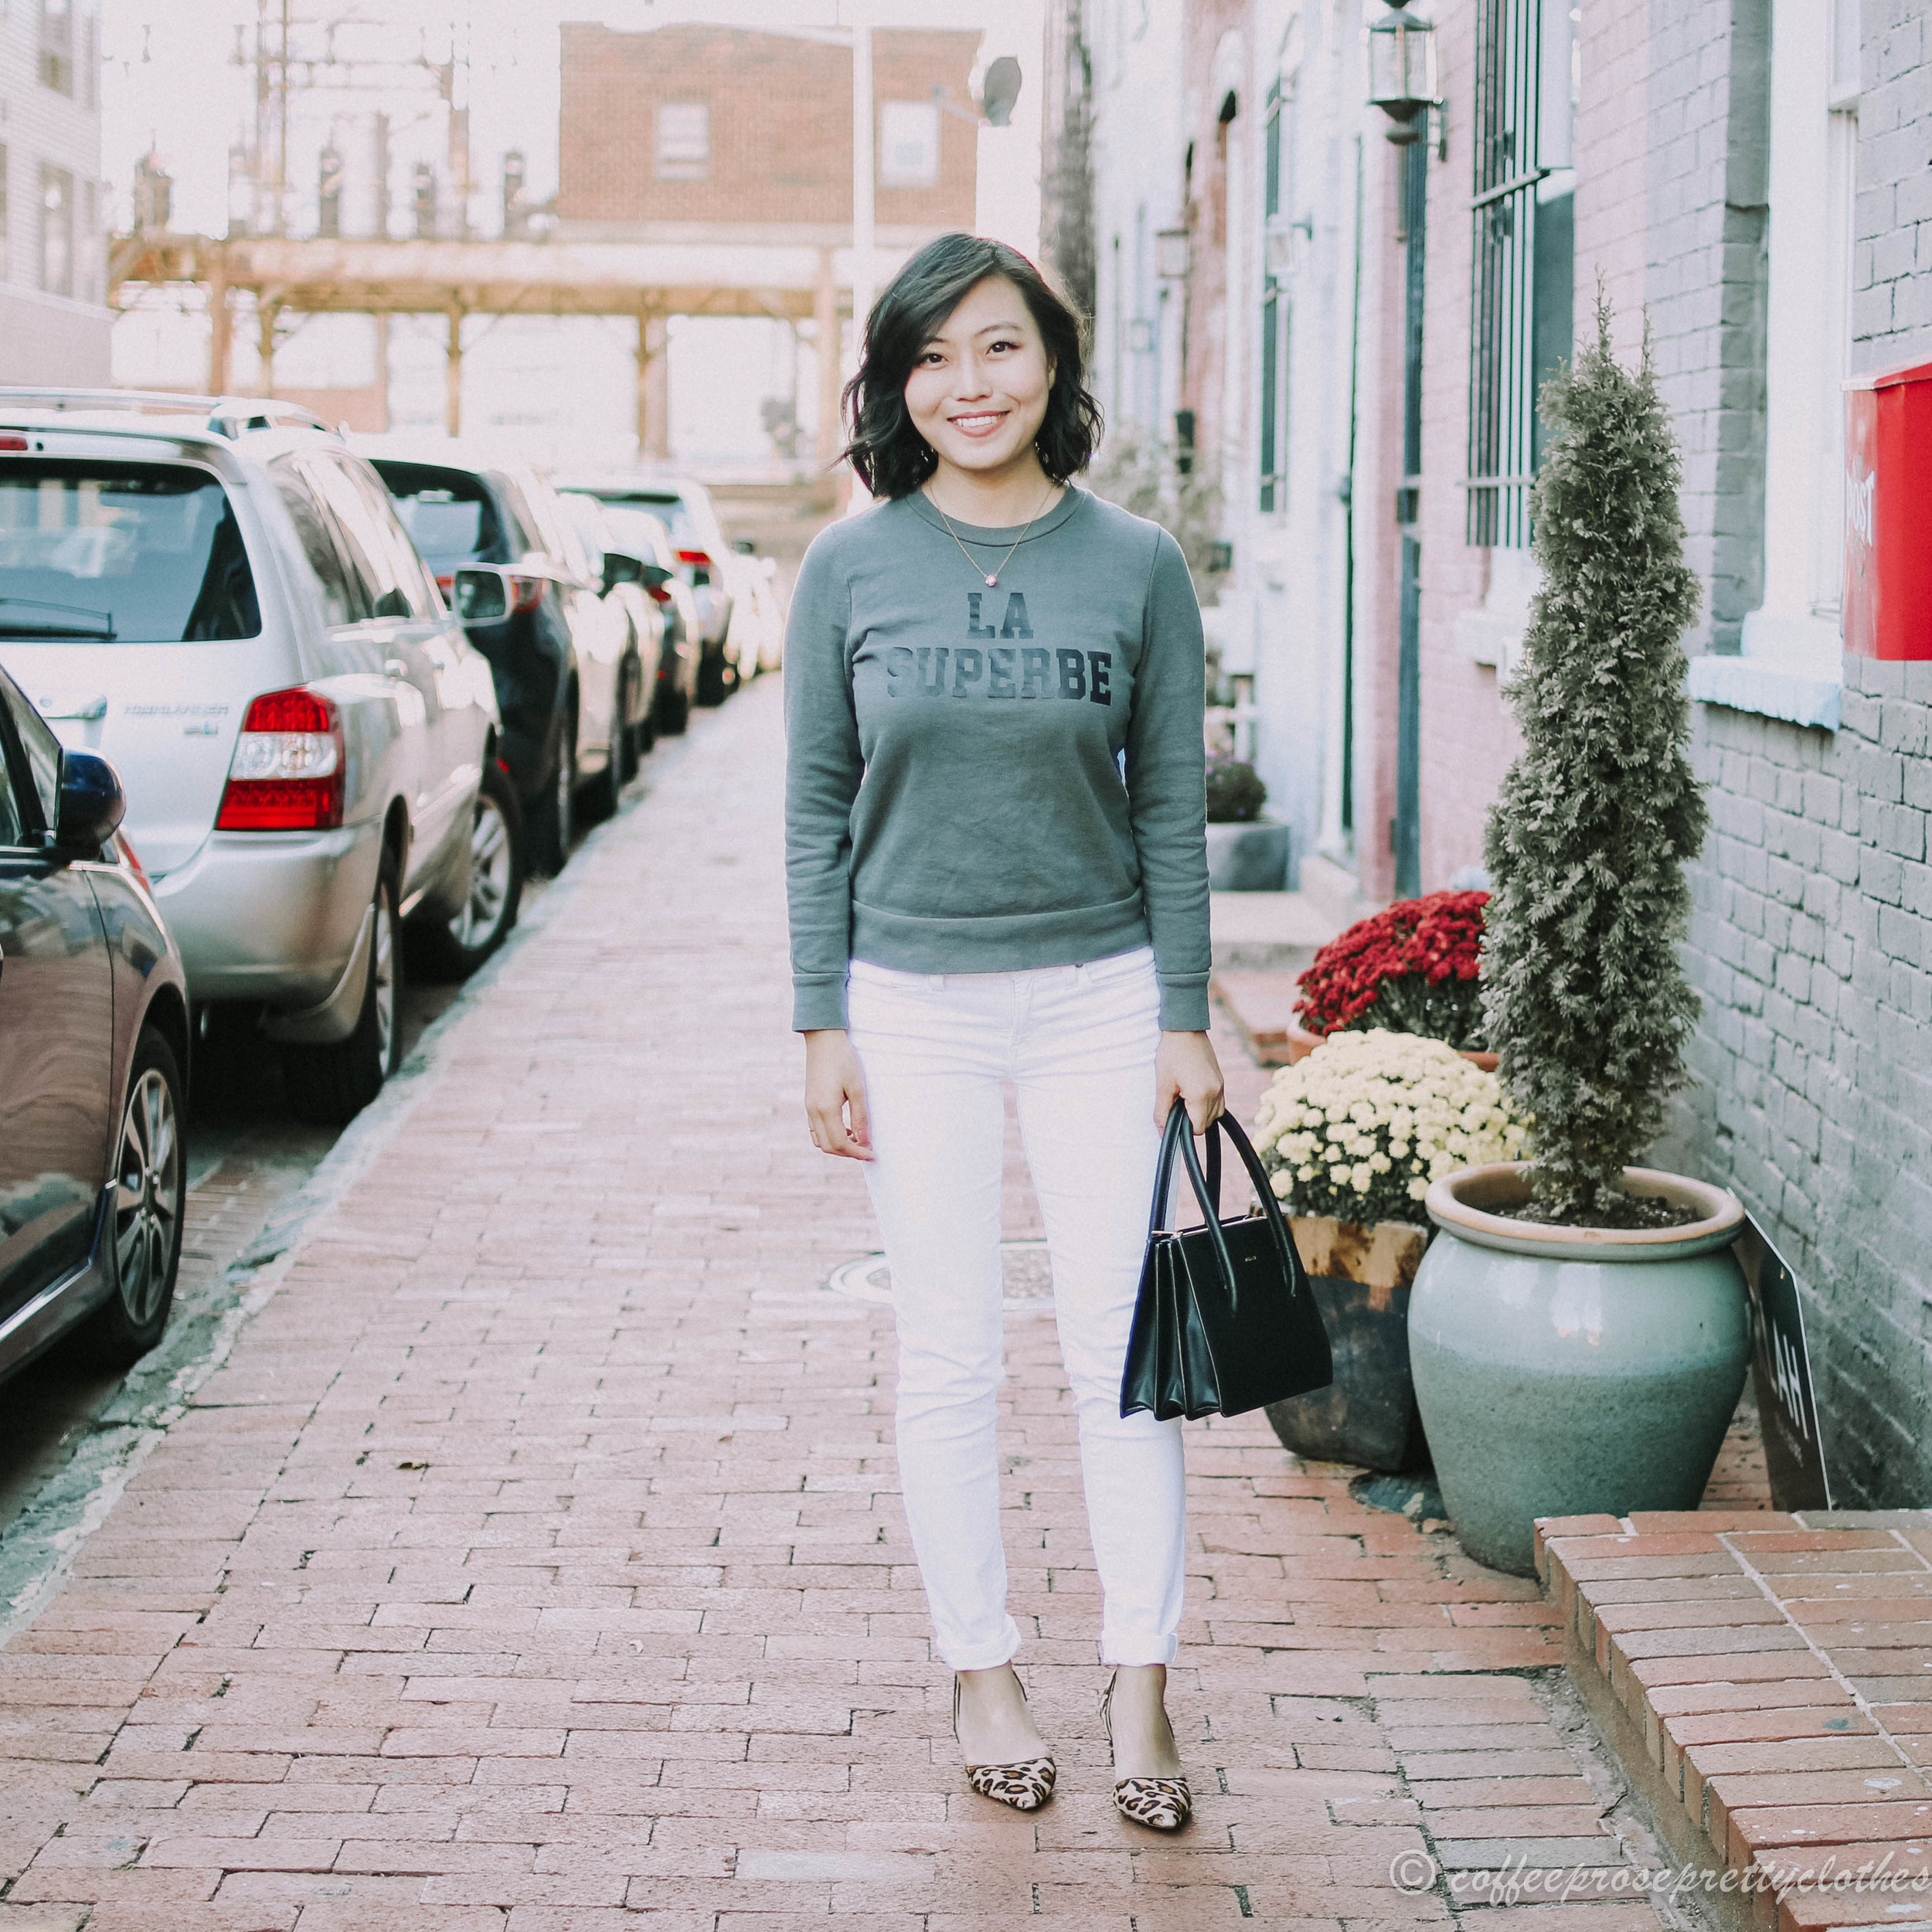 Sezane La Superbe Sweater and J.Crew white toothpick jeans, Angela Roi Eleanor Satchel, Sole Society Jenn Leopard heels